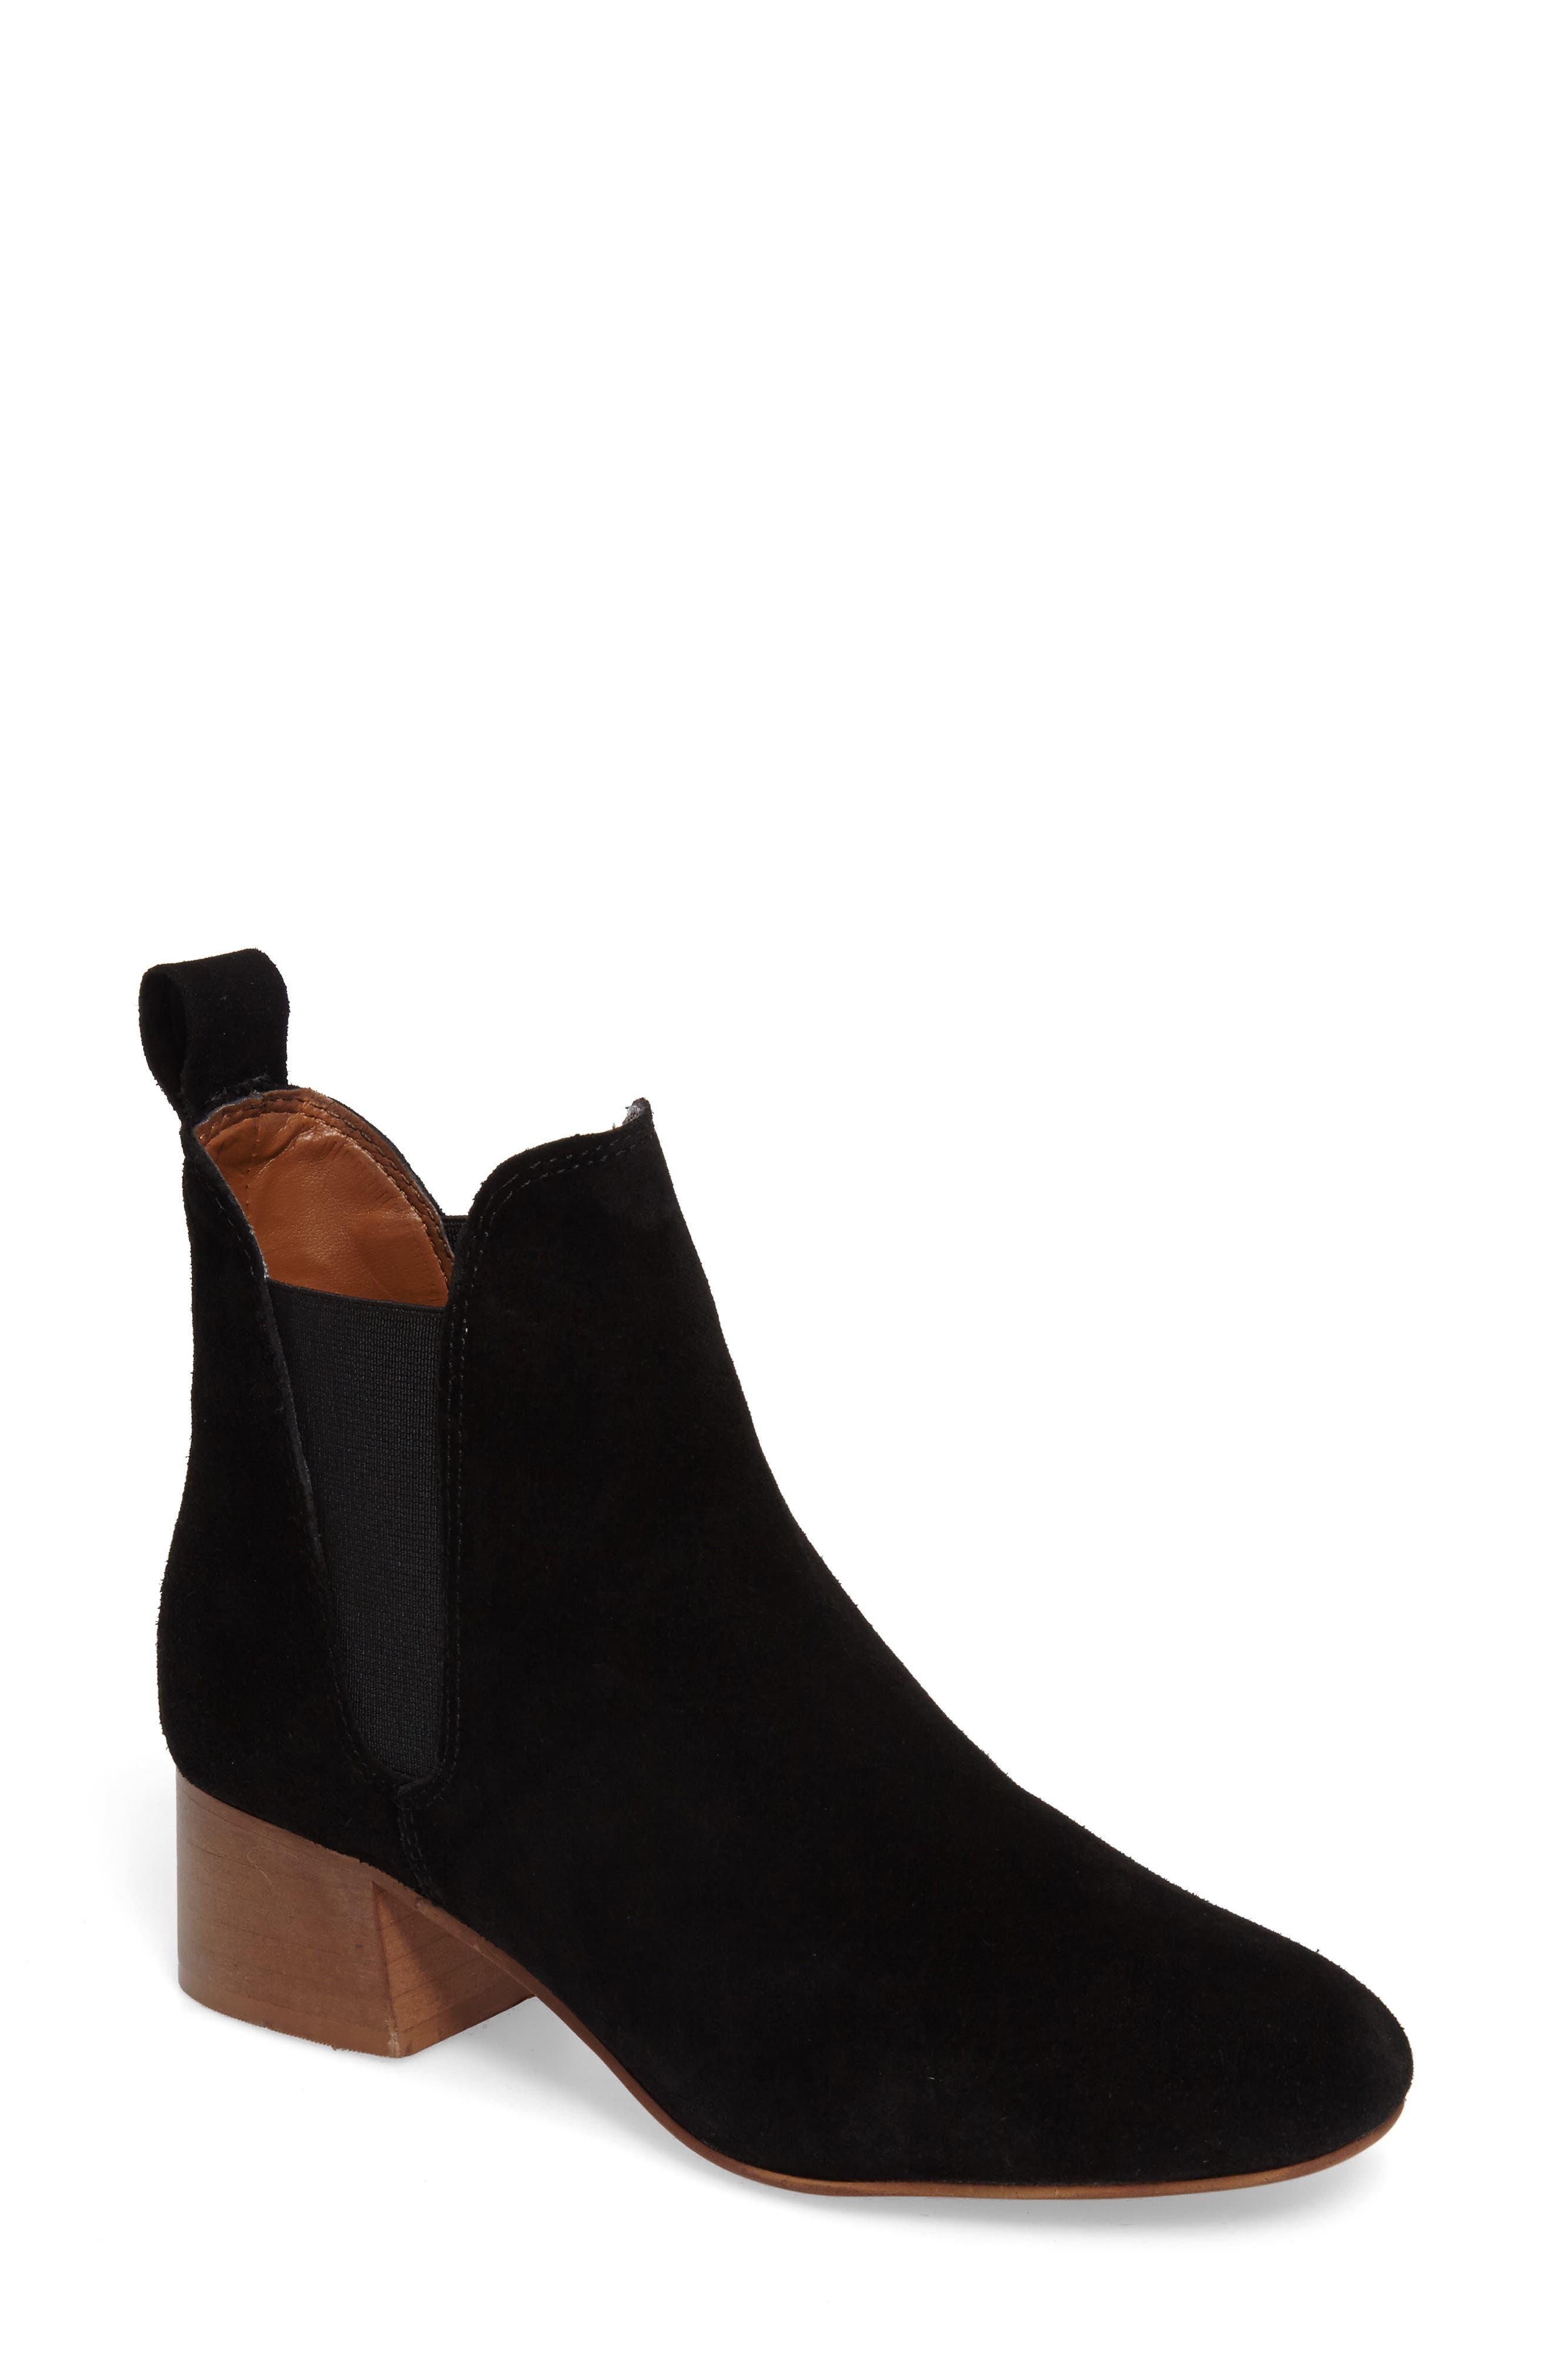 Barley Chelsea Boot,                             Main thumbnail 1, color,                             Black